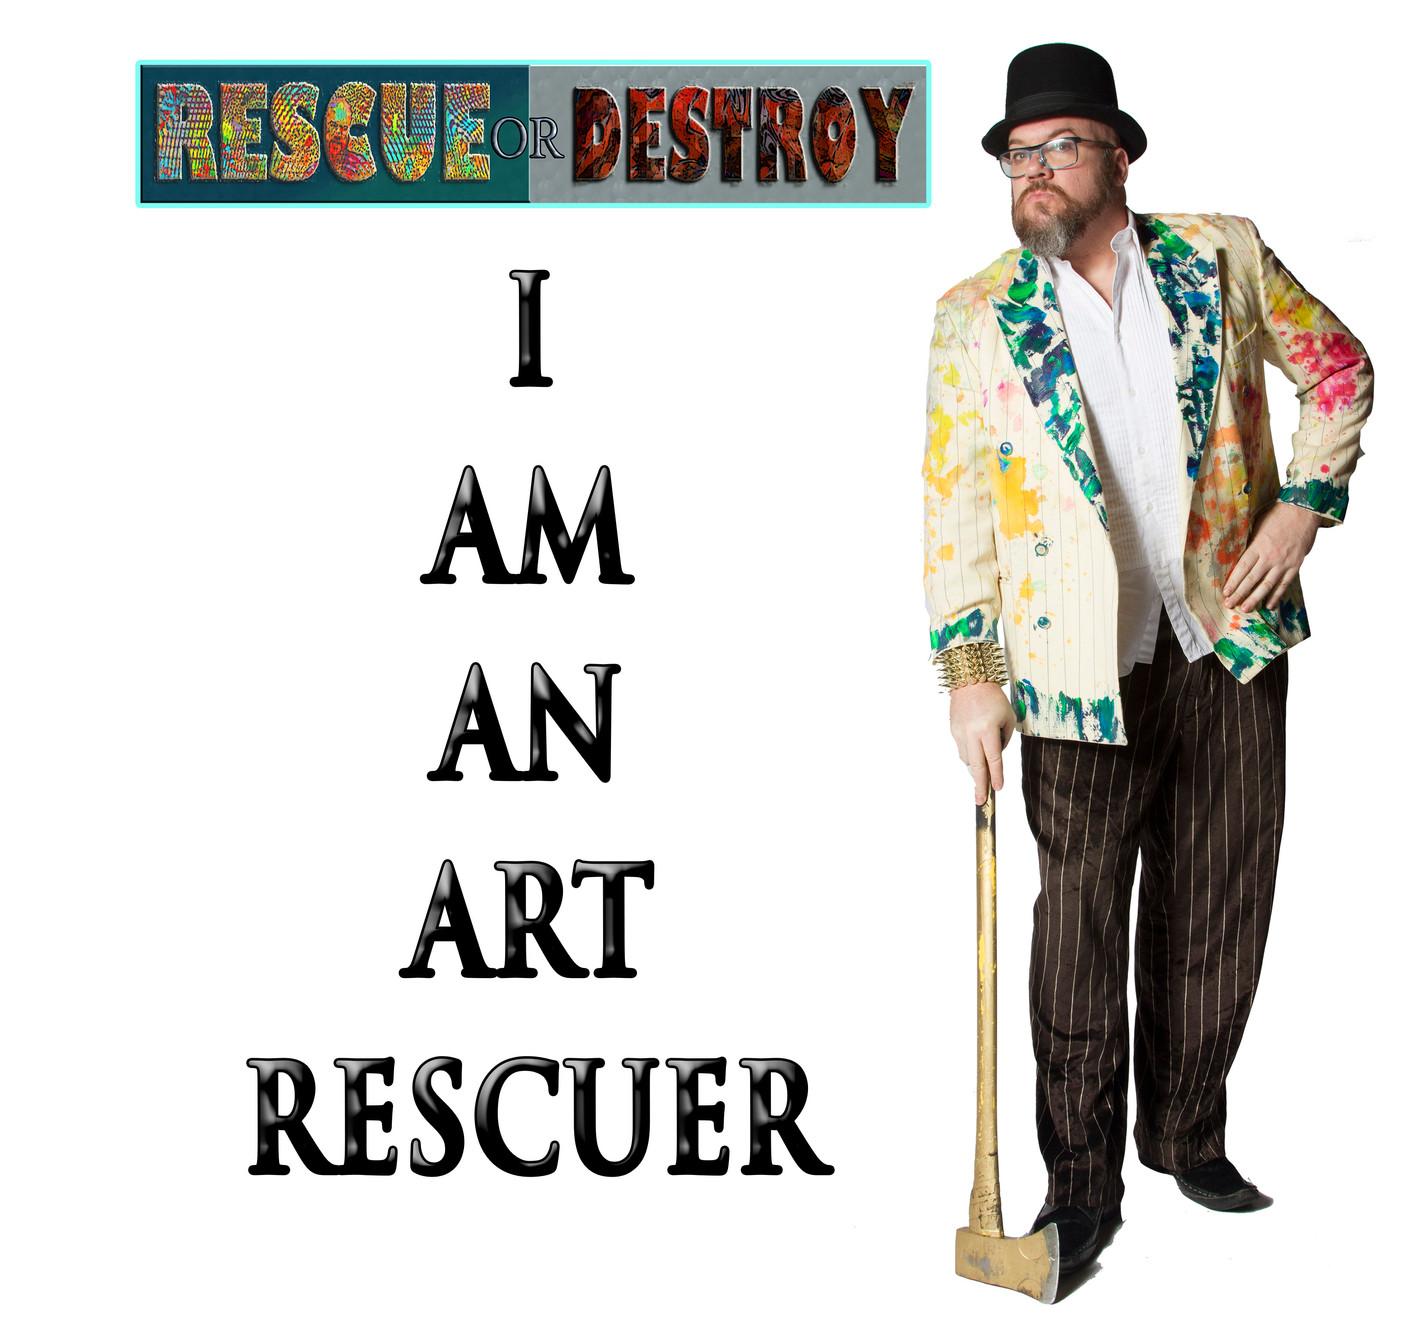 (c) Rescueordestroy.net